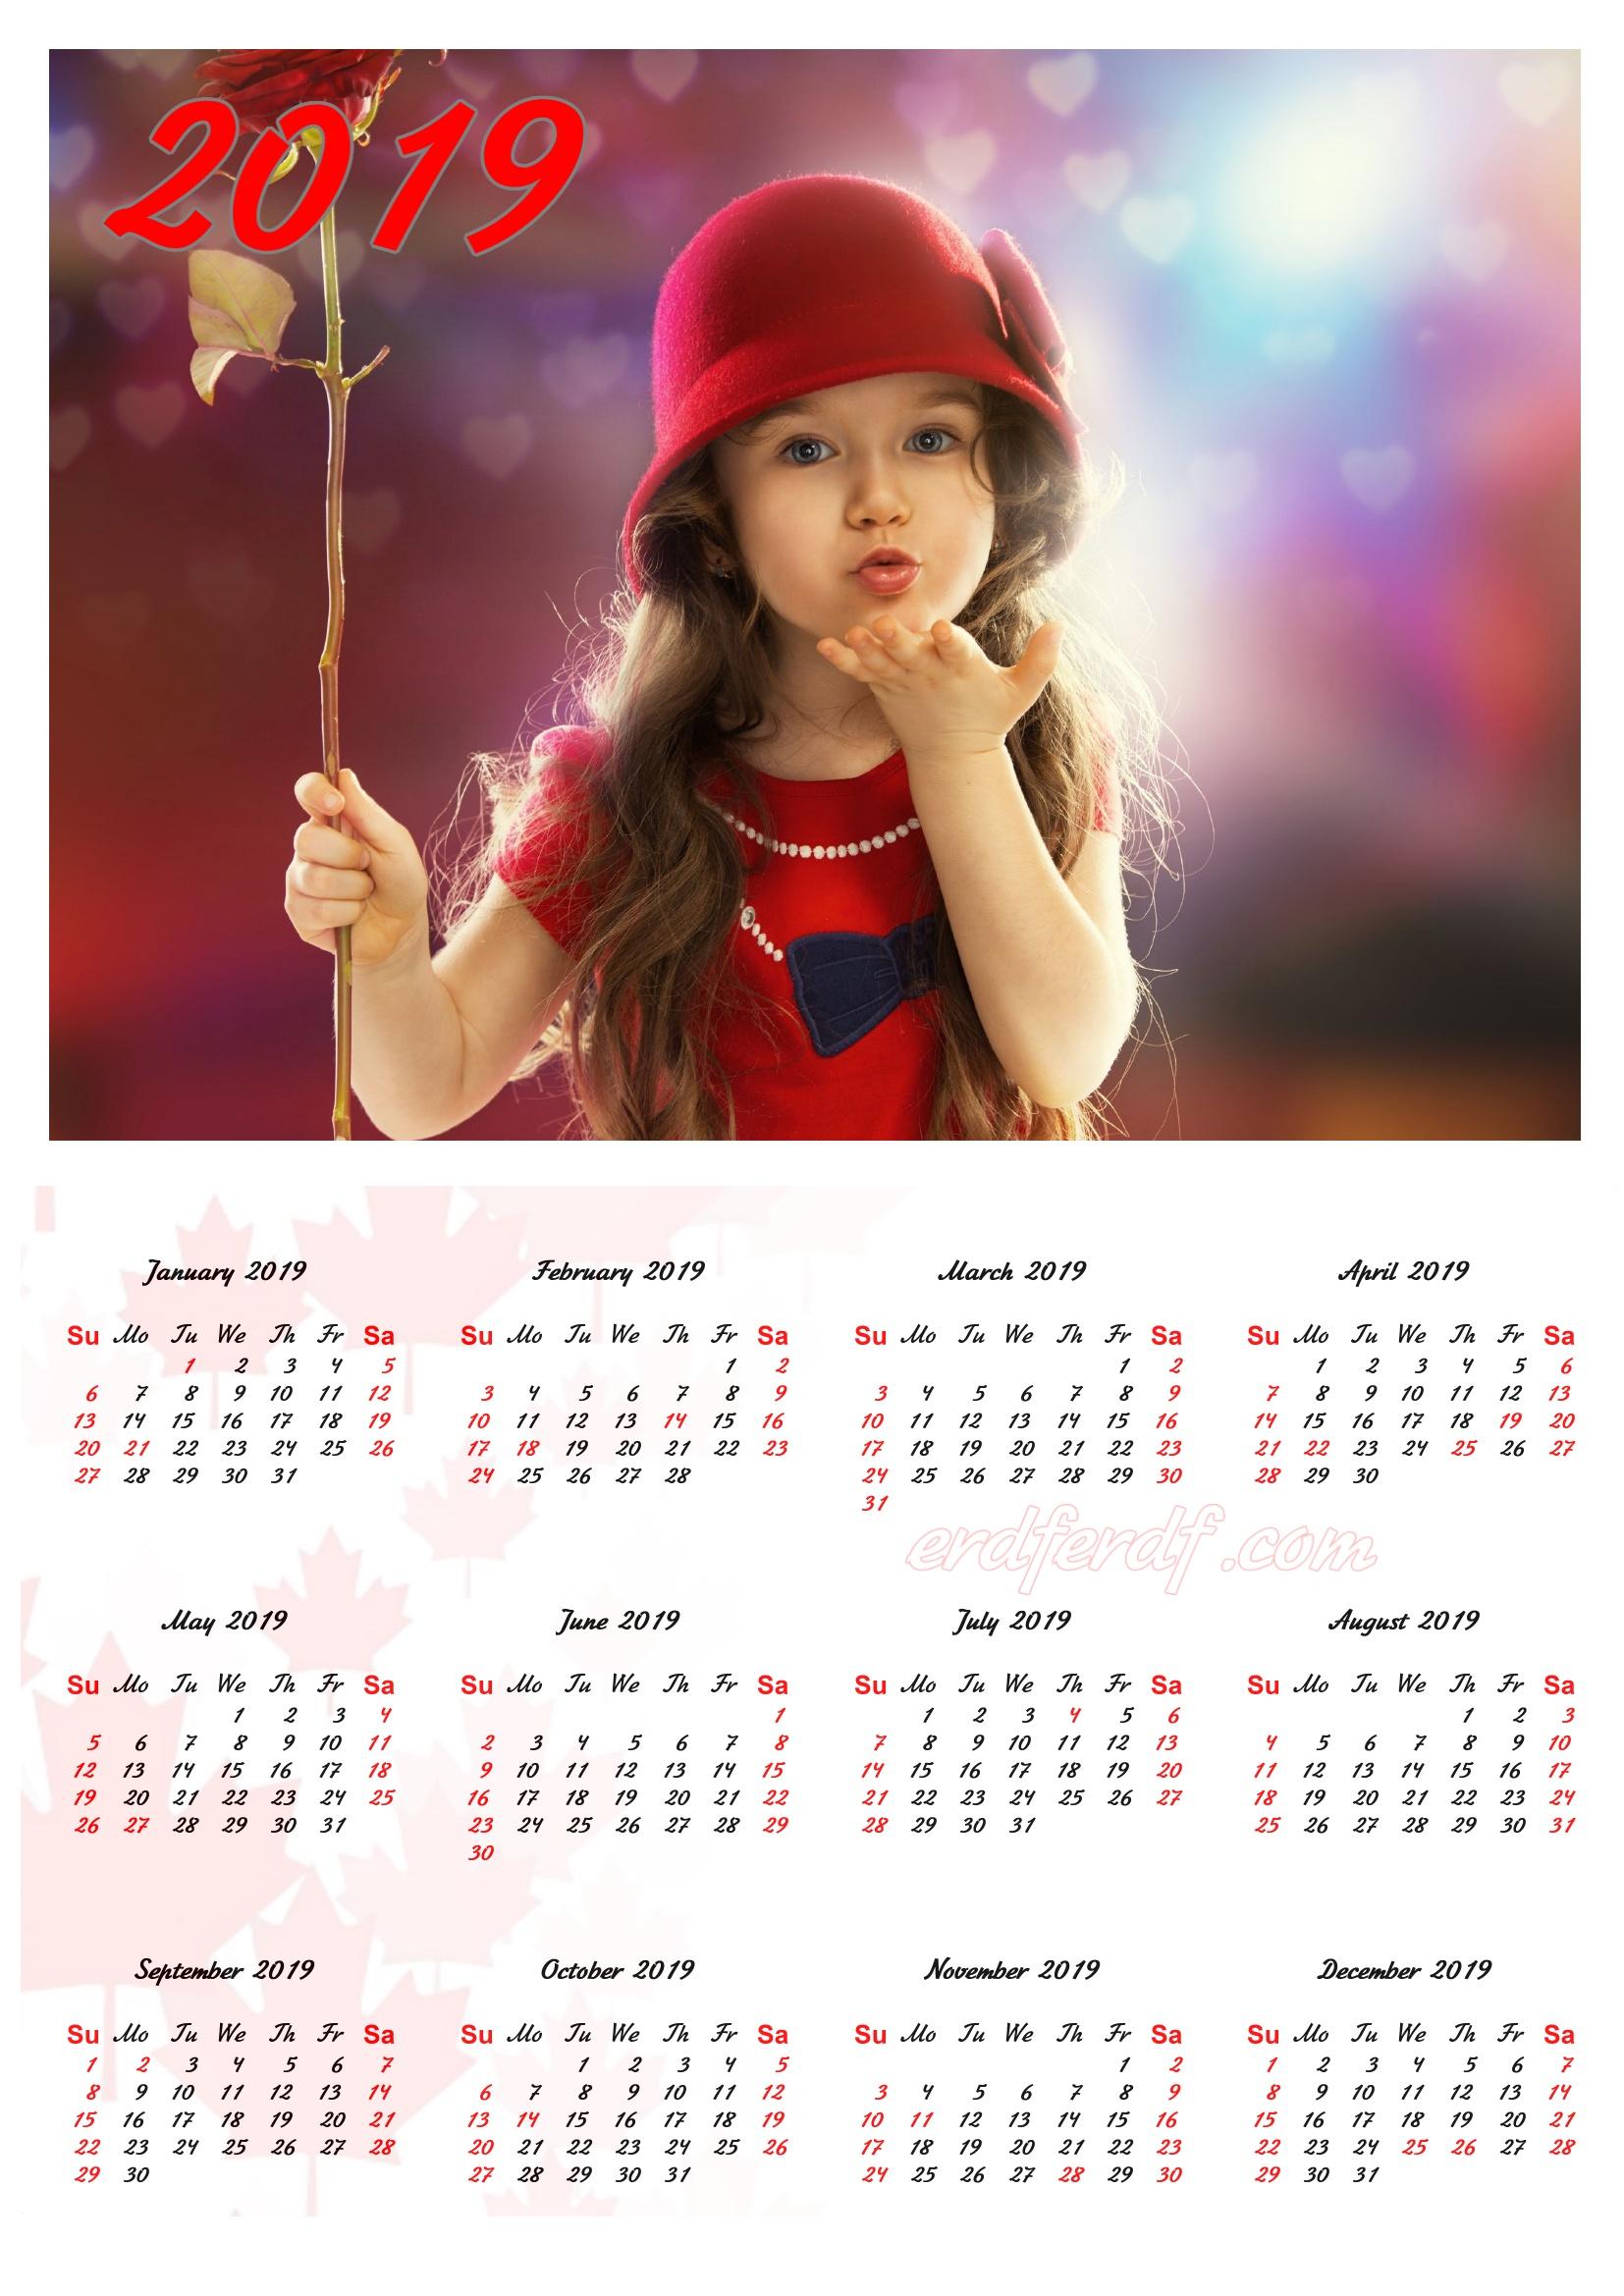 Very Cute Girl Canada 2019 Calendar Printable Free Download